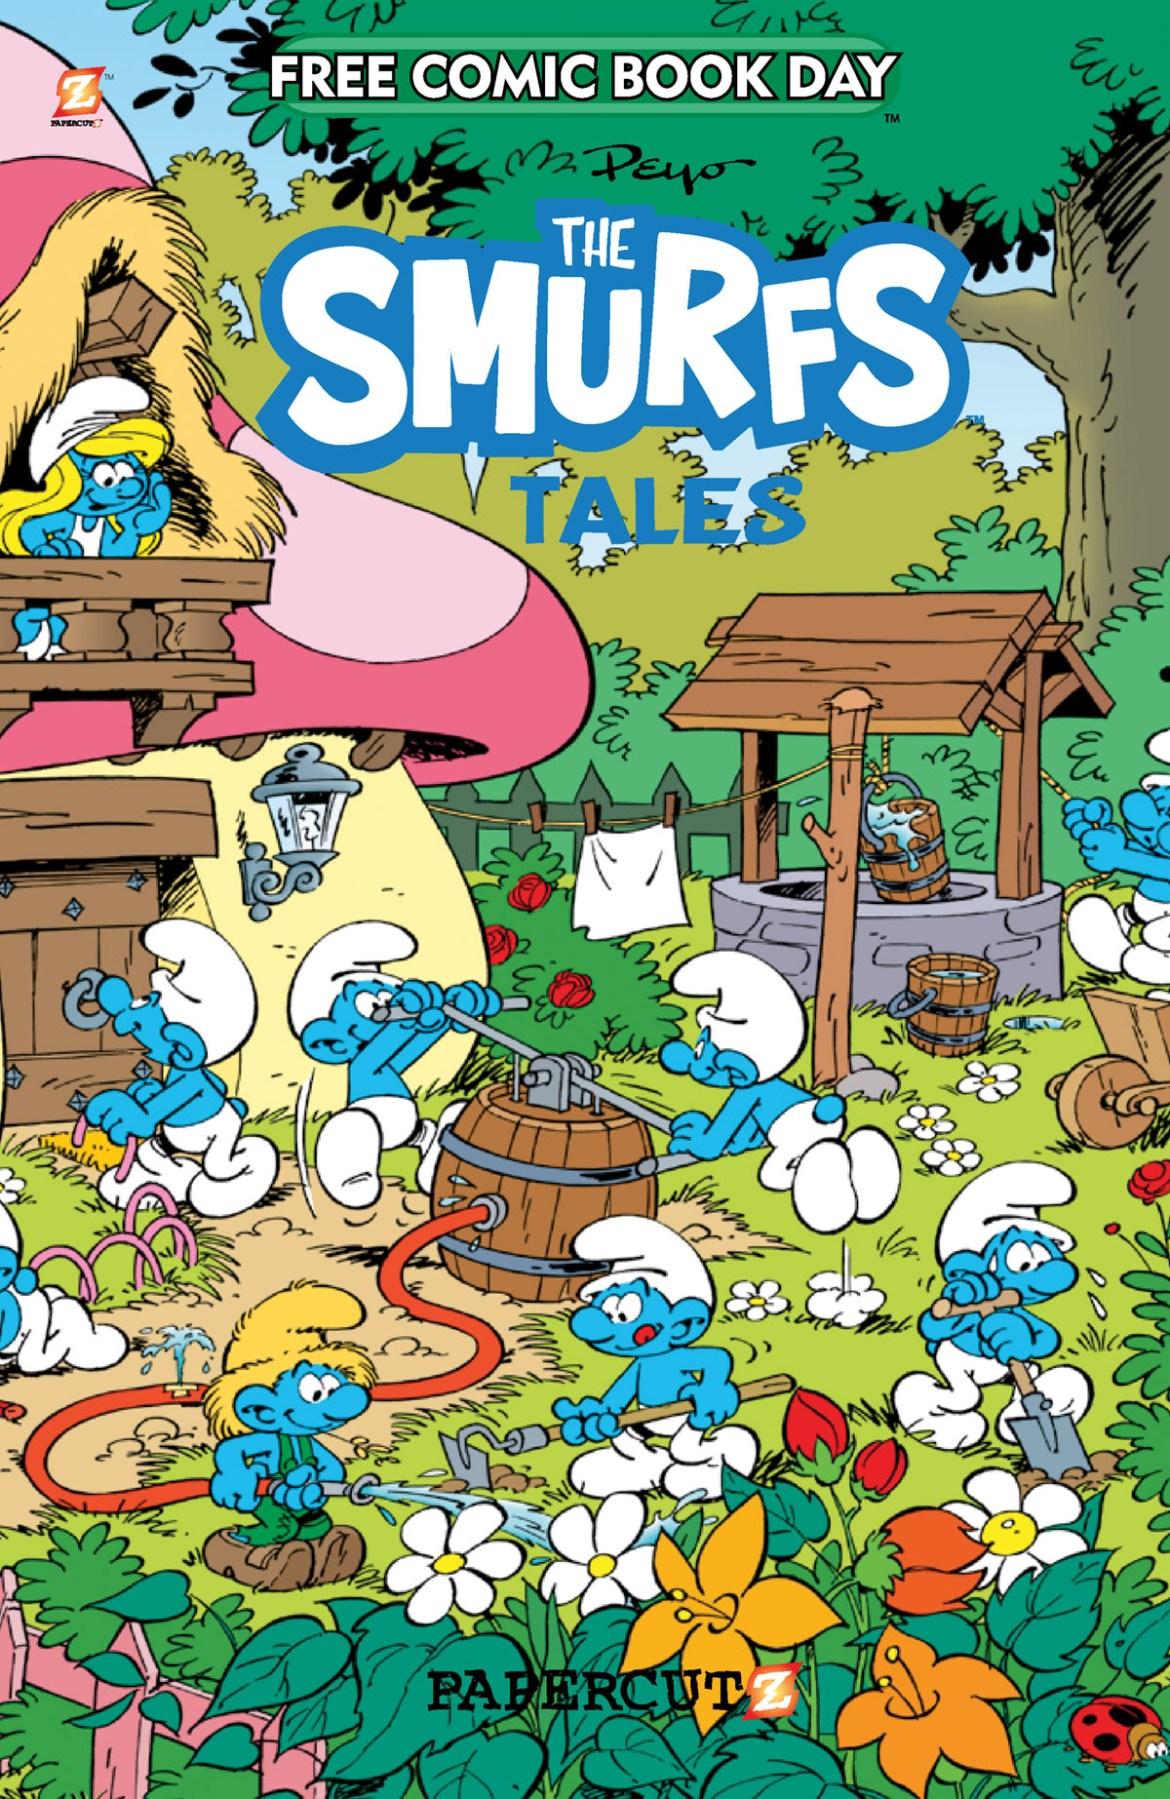 FCBD21_SILVER_Papercutz_Smurf-Tales Complete Free Comic Book Day 2021 comic book line-up announced